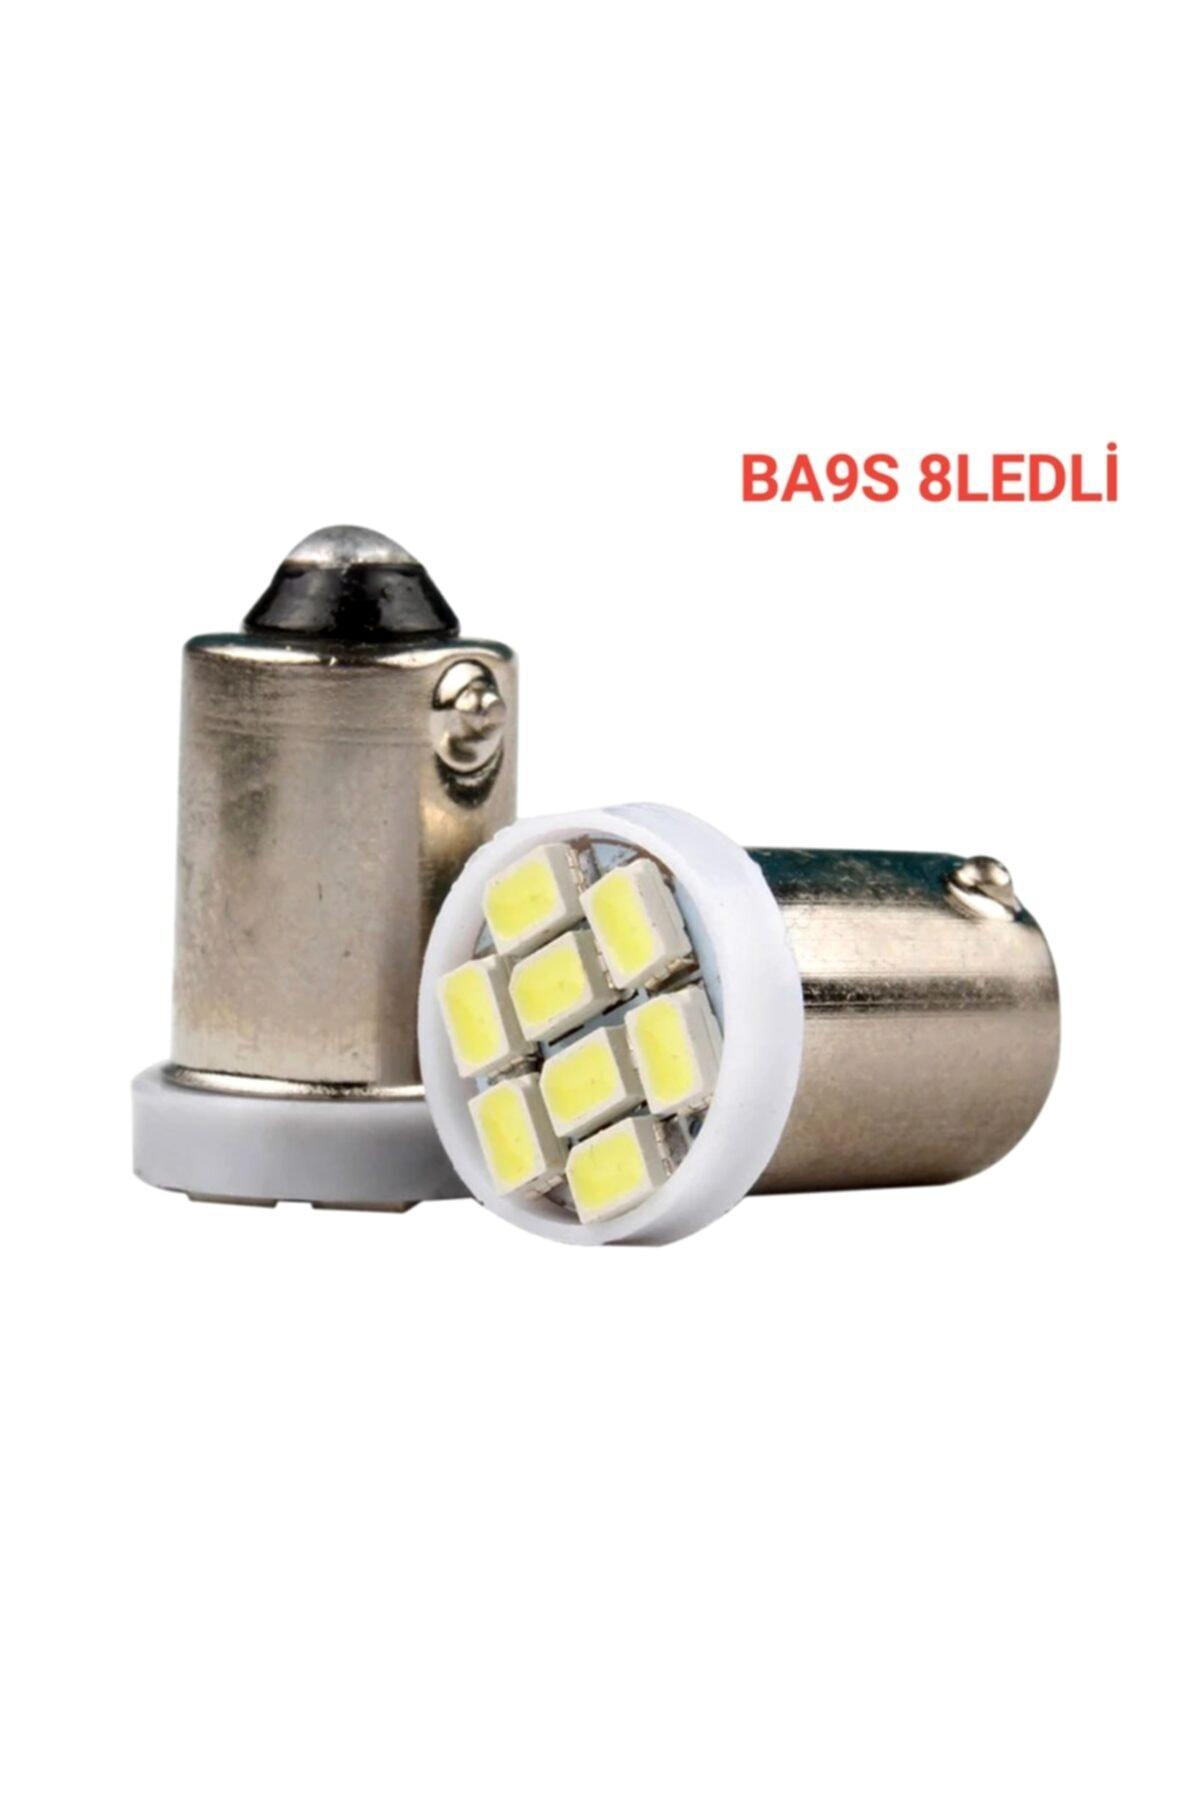 Ba9s Led Ampul Soket Tipi Ba9s Tırnaklı 8 Ledli Beyaz 12v 2ad Mini Boy